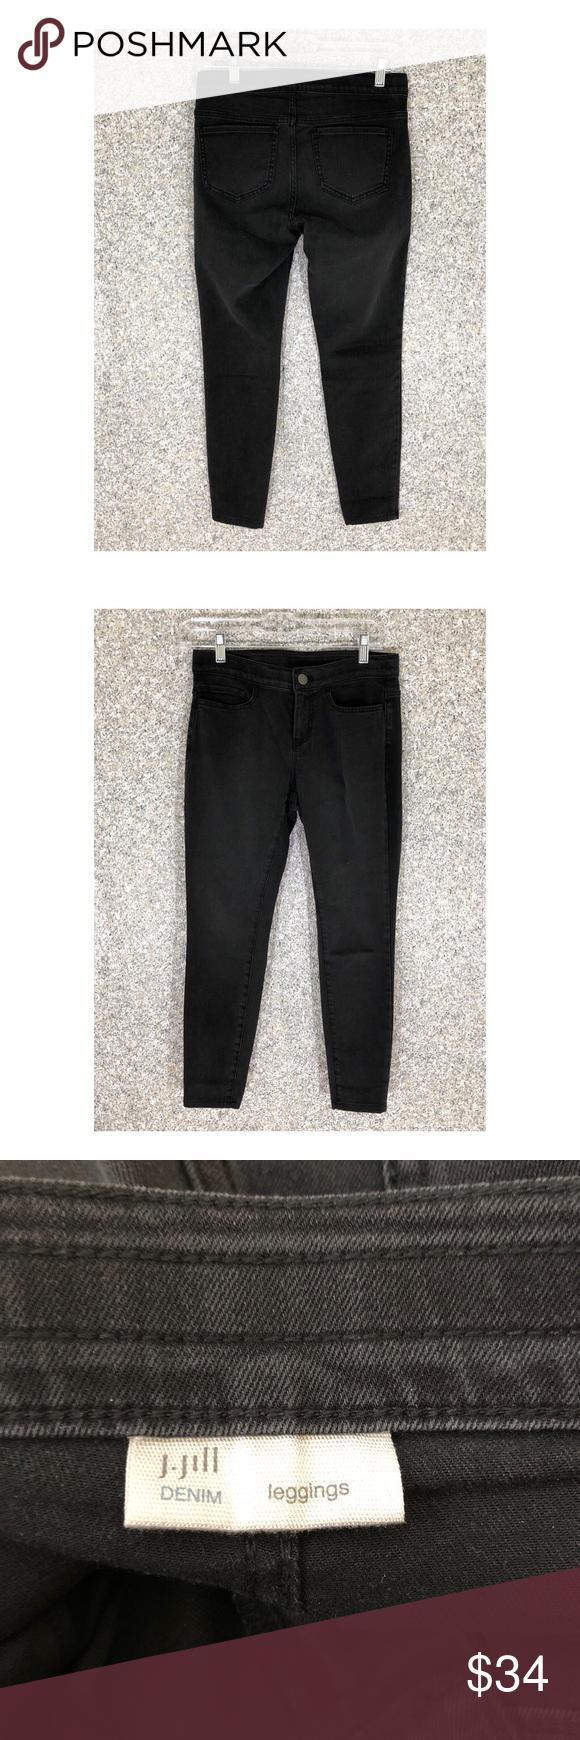 1cd56a4ad8cd7 J.Jill Stretch Leggings Jeans • 4 Petite #258 J.Jill Black Leggings ...